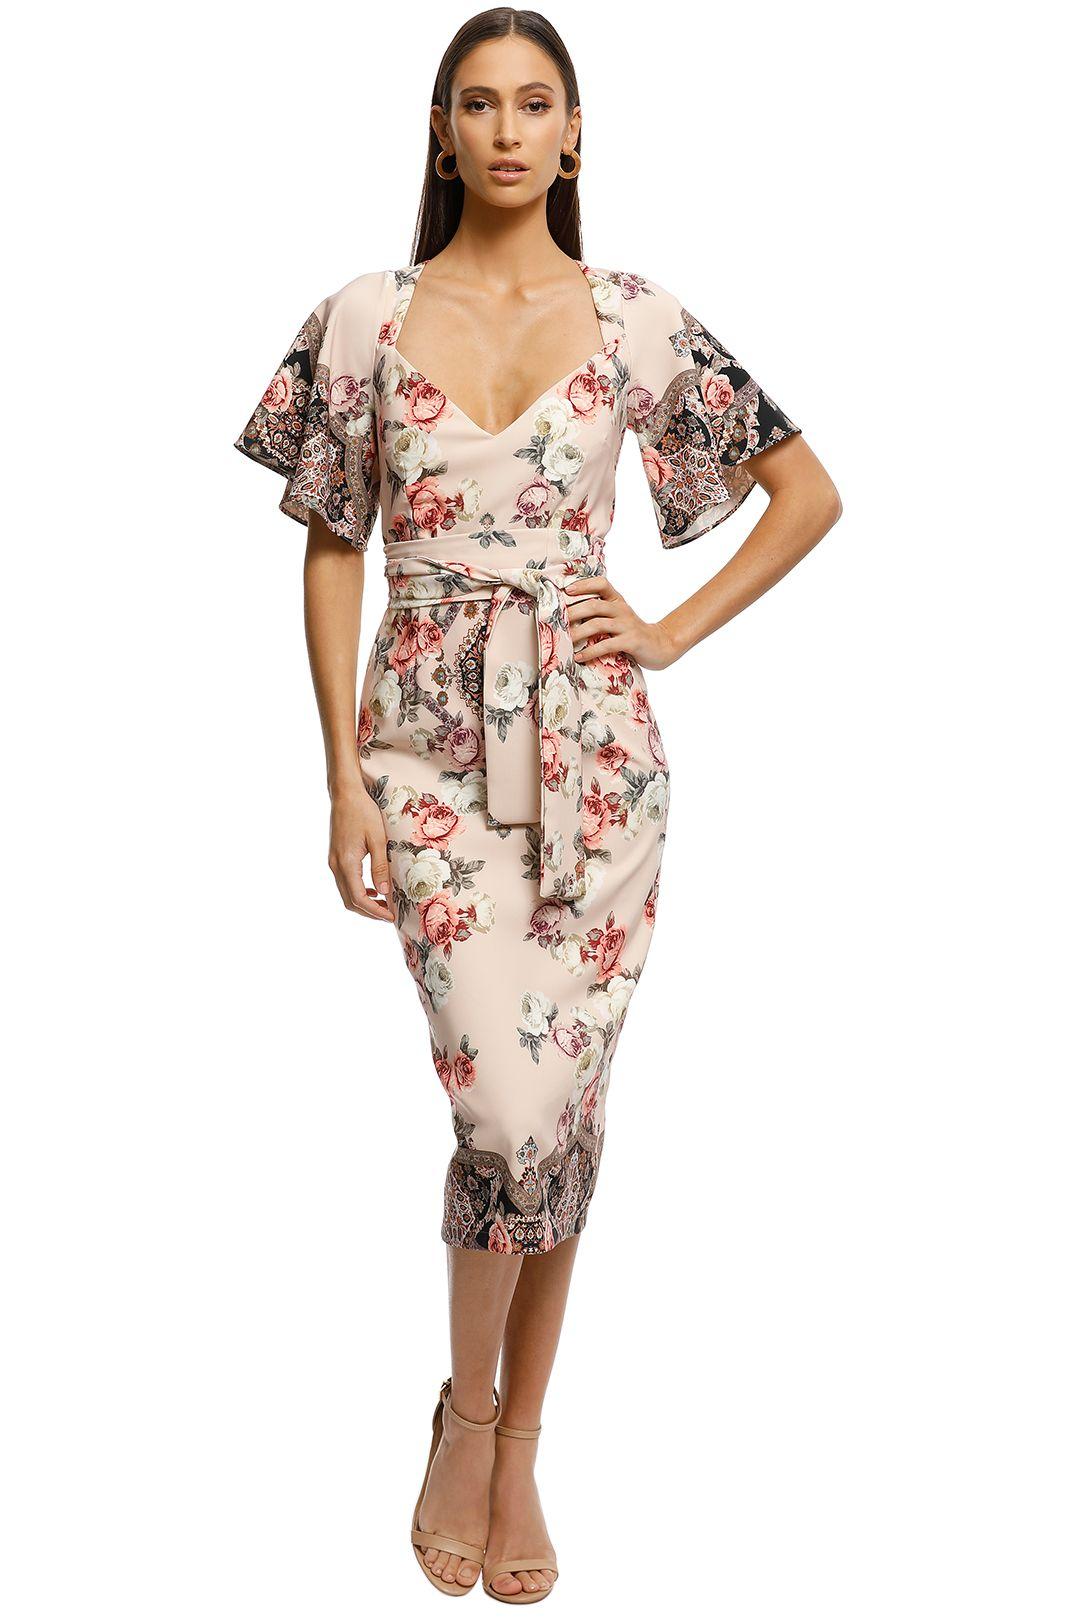 Pasduchas-Chichi-Sleeve-Midi-Dress-Floral-Blush-Front